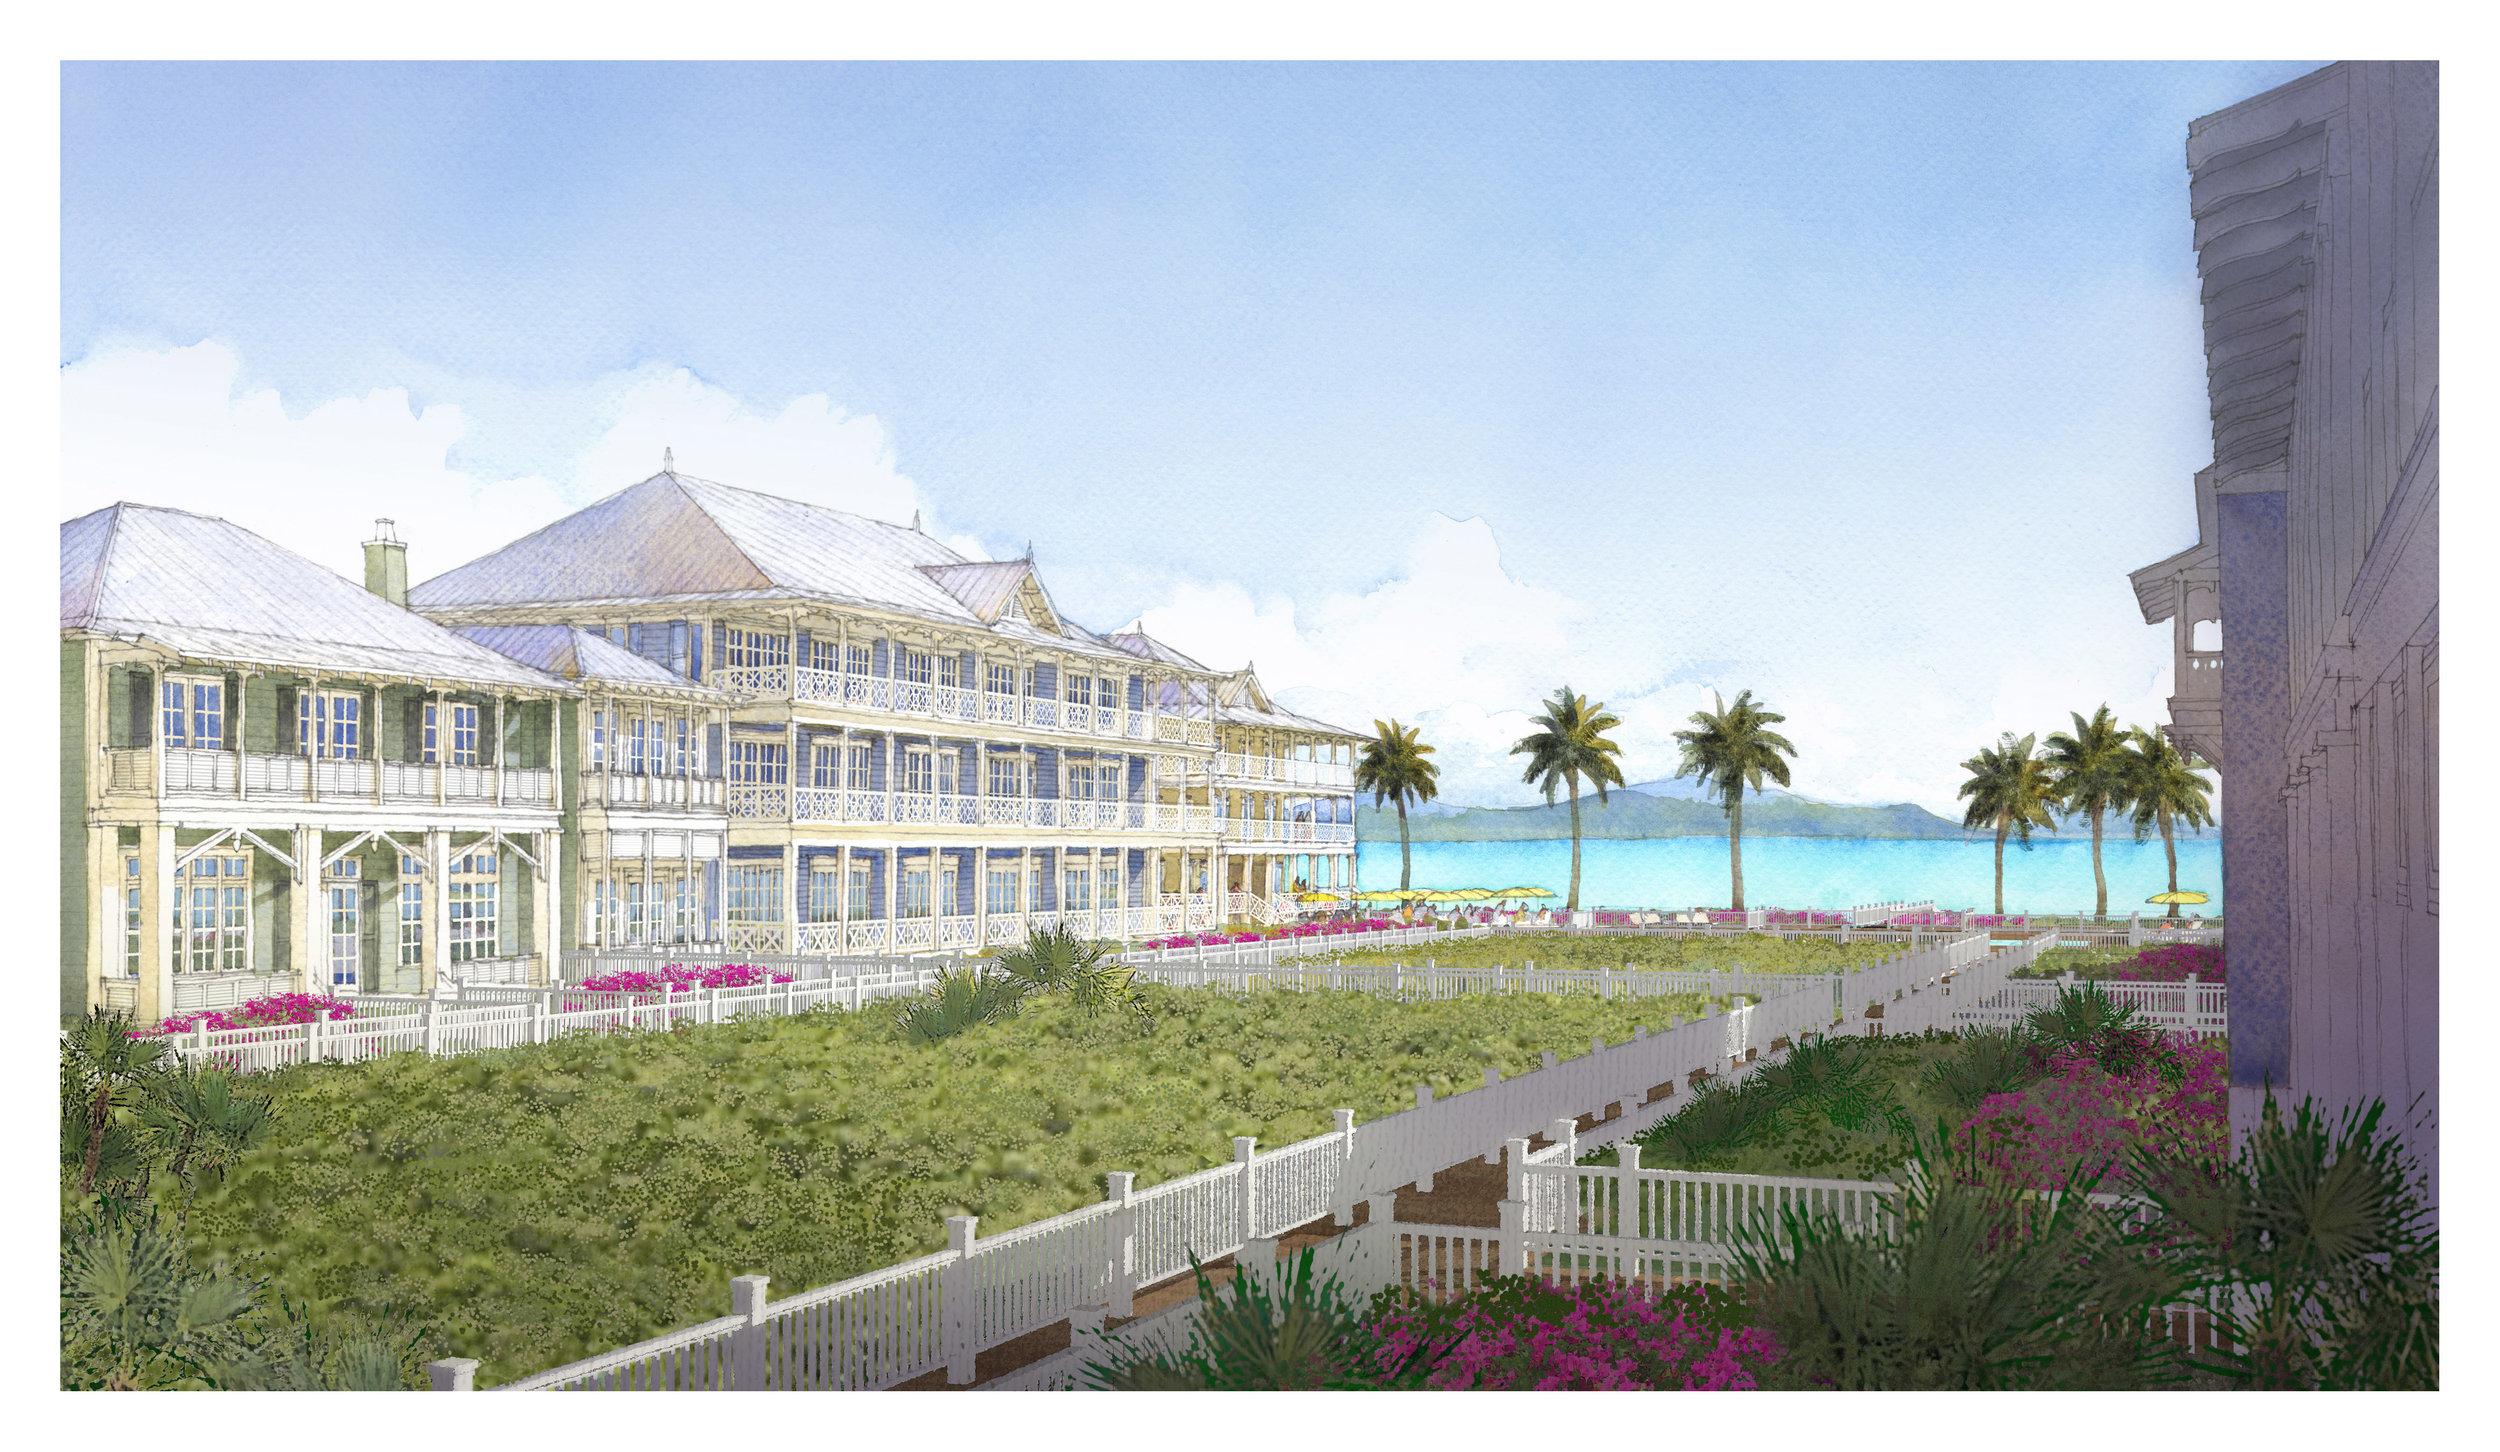 Anguilla-View2-wc3-AIA.jpg